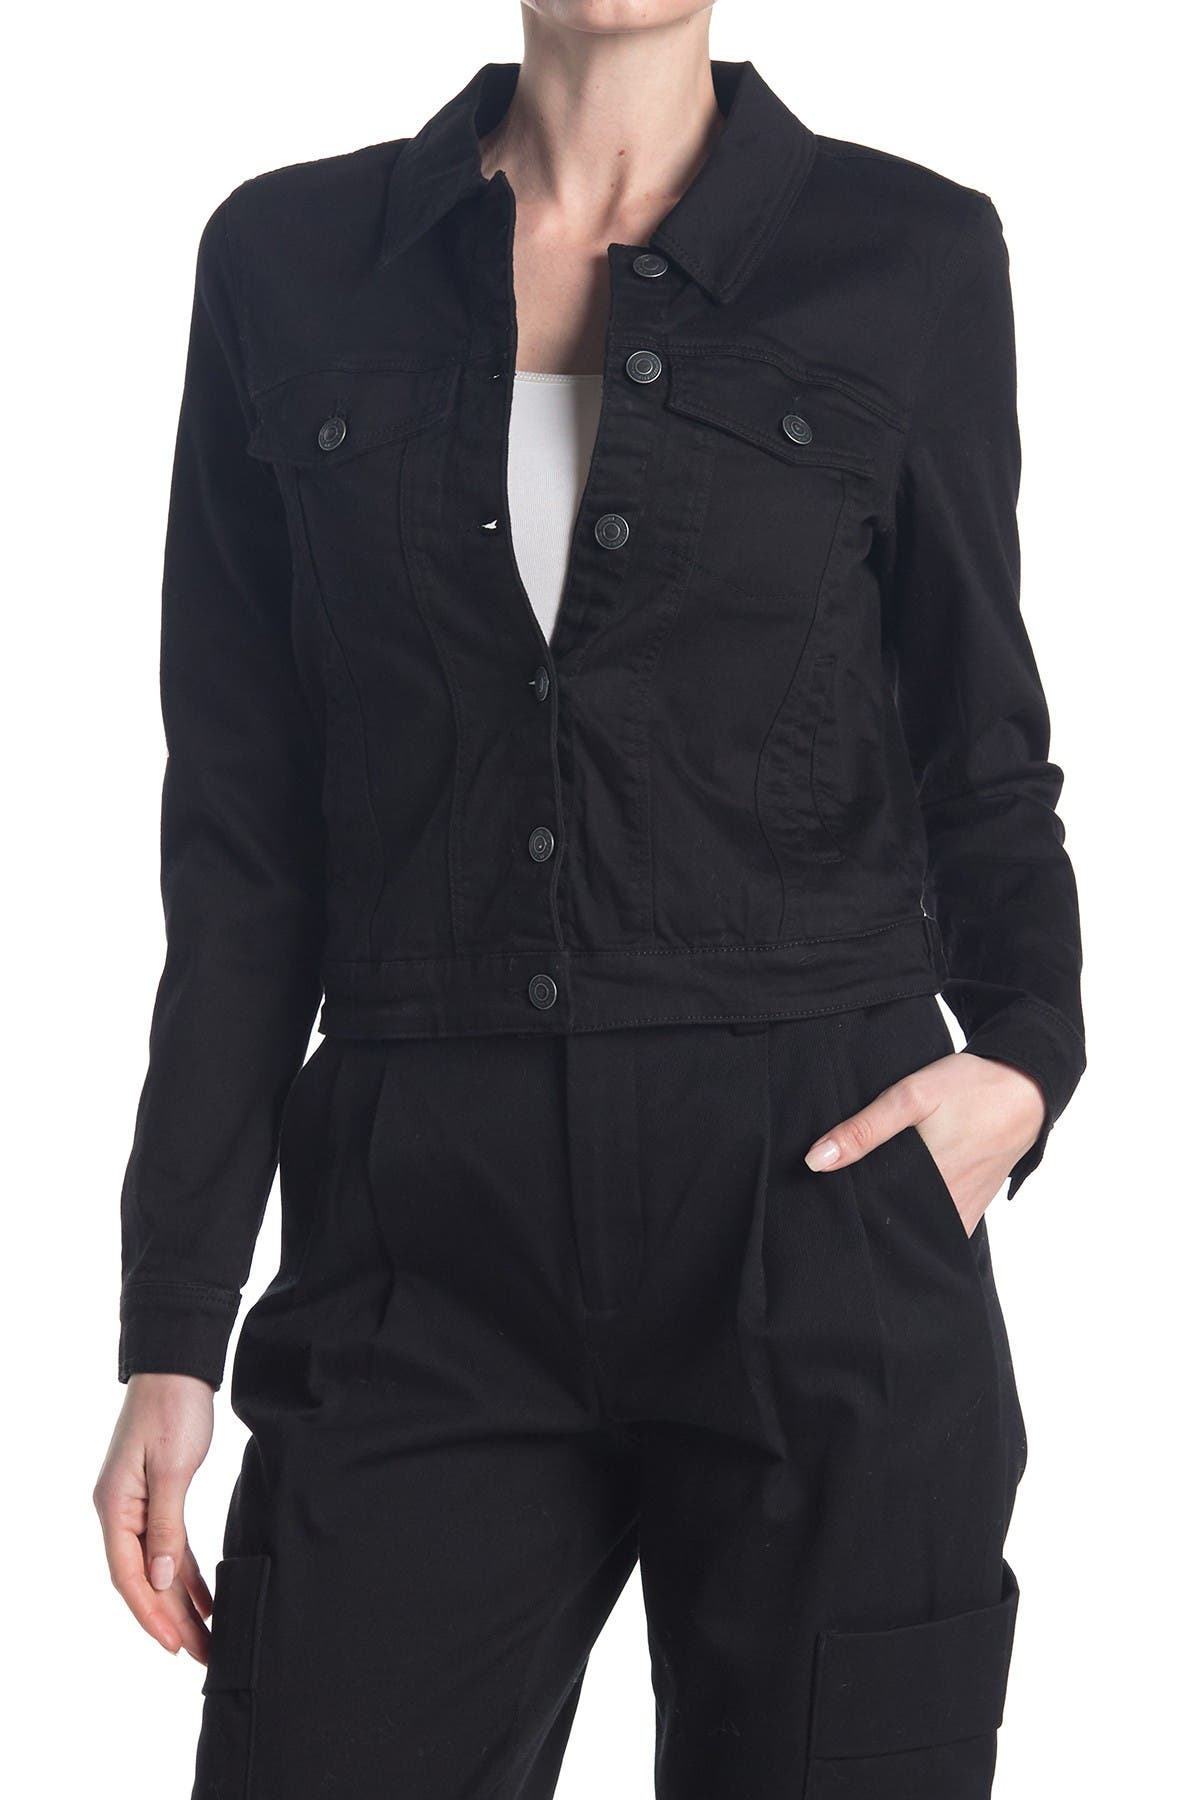 Image of VERO MODA Long Sleeve Button Up Jacket